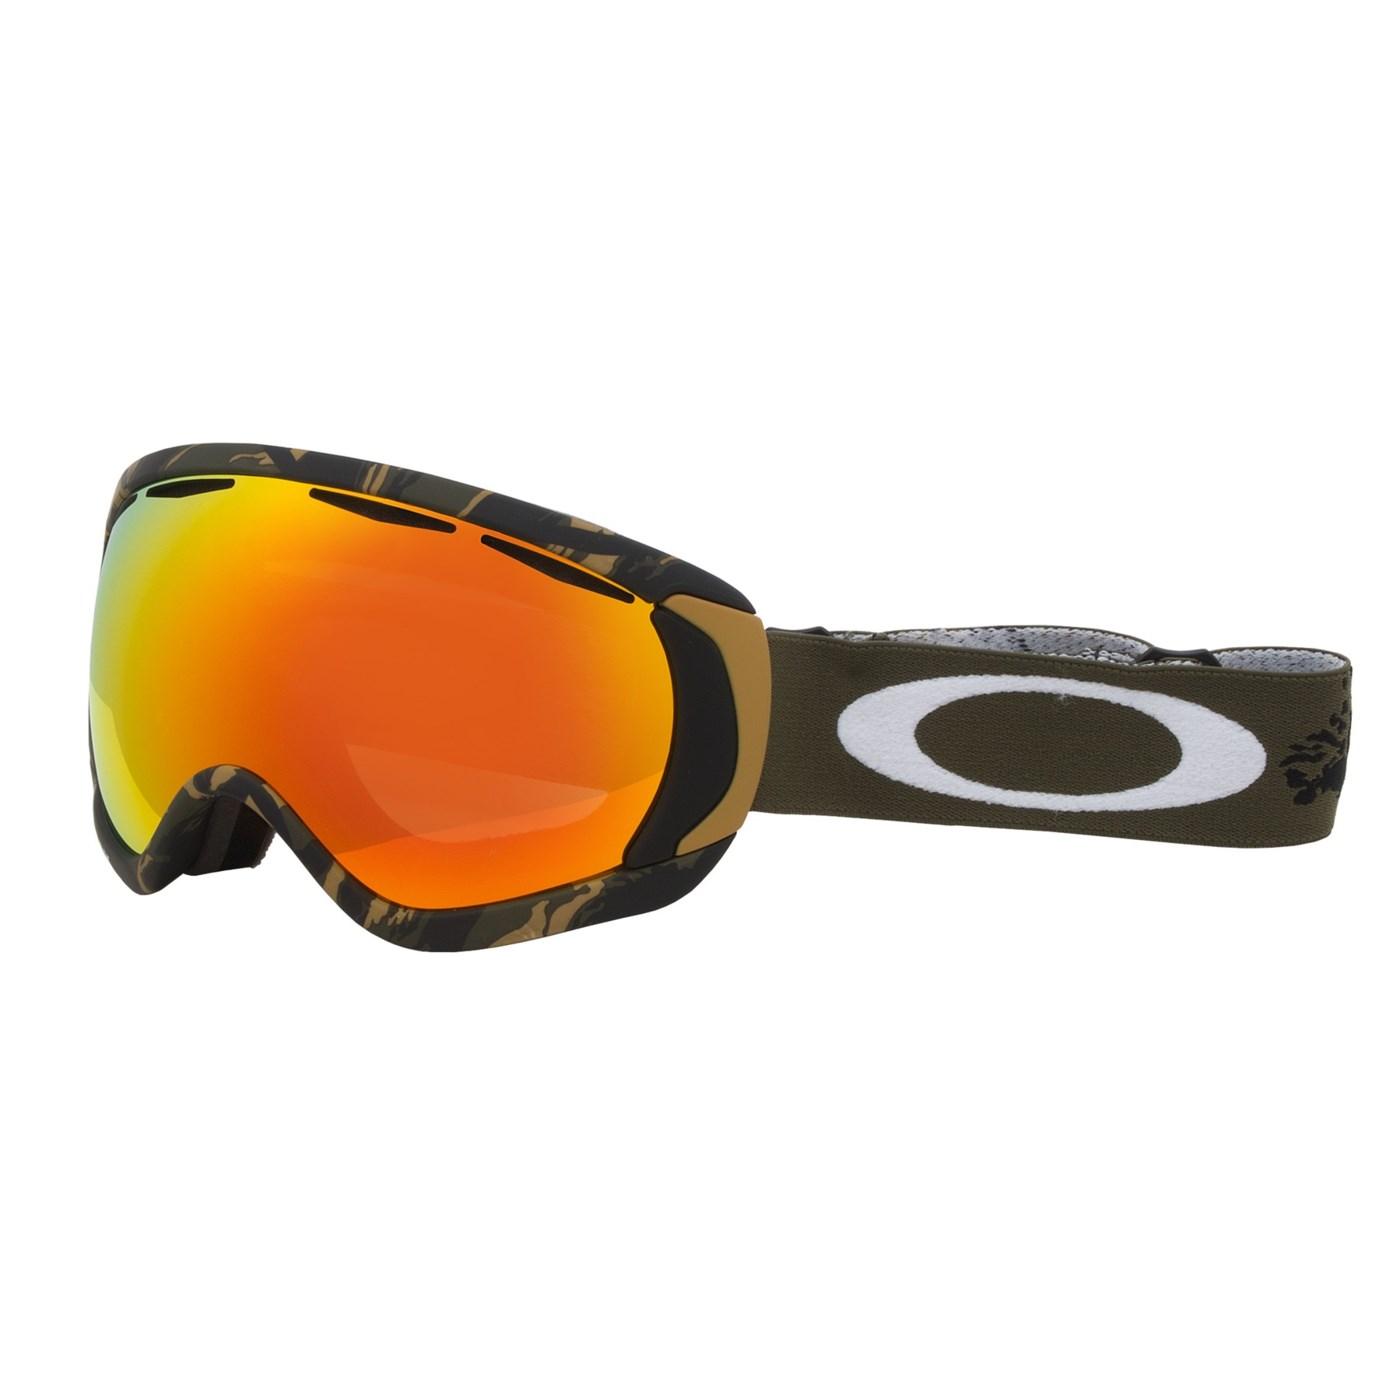 35b9833ae0 Oakley Canopy Signature Series Snowsport Goggles Iridium® Lens 7384Y ...